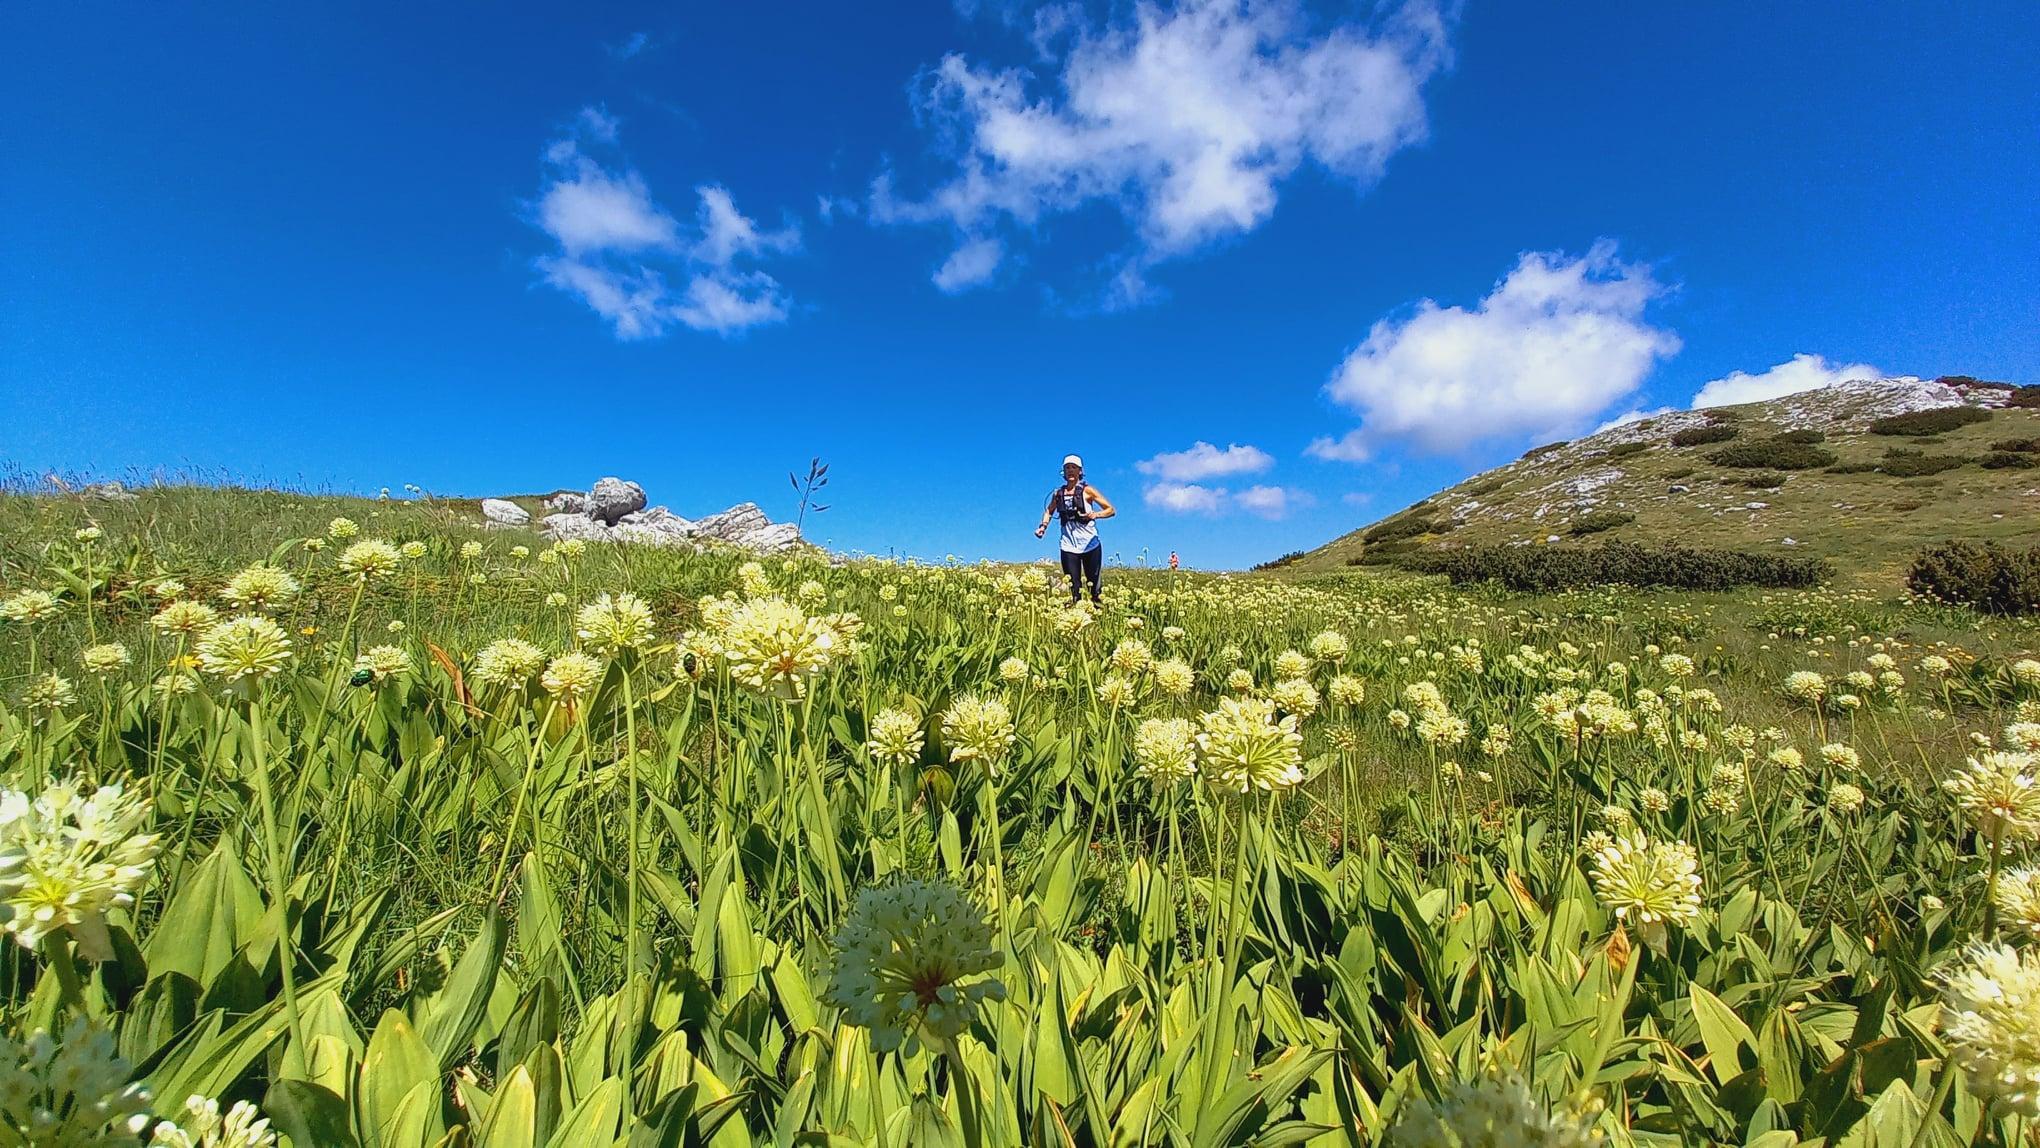 Trenutno pregledavate Velebit – Premužićeva staza Video